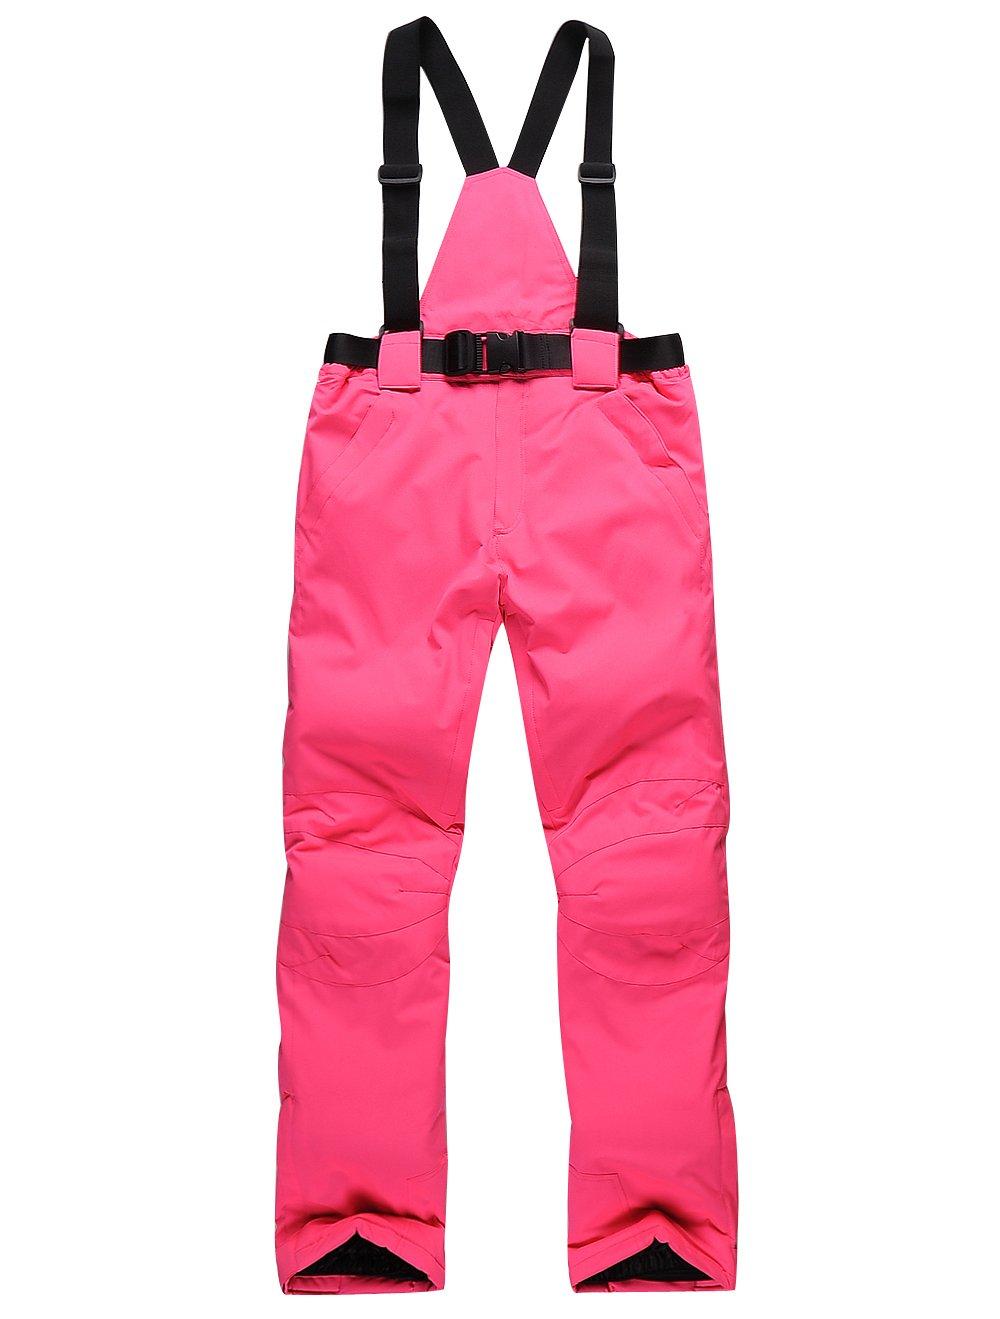 HOTIAN Women's High Windproof Waterproof Bright Color Ski Snowboarding Pants